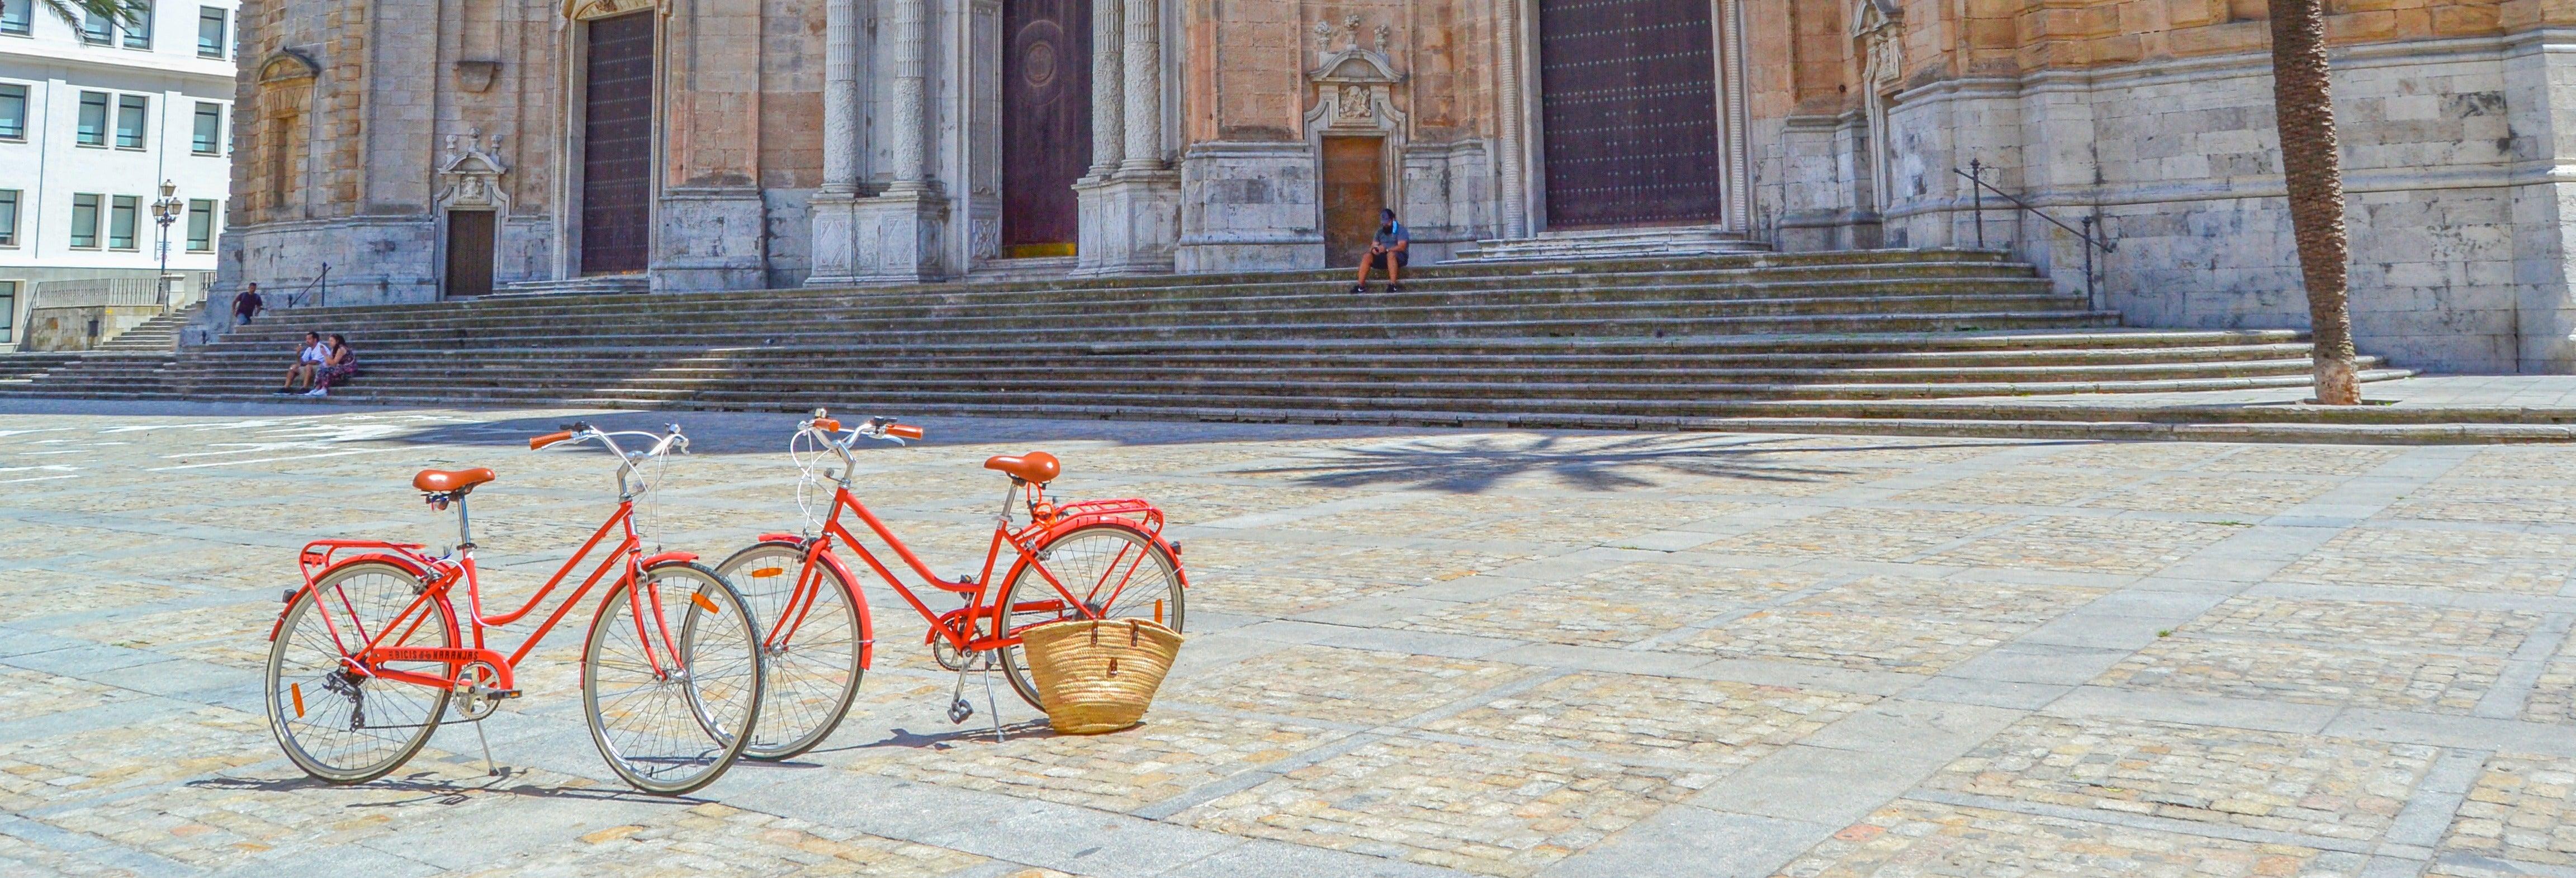 Alquiler de bicicleta en Cádiz